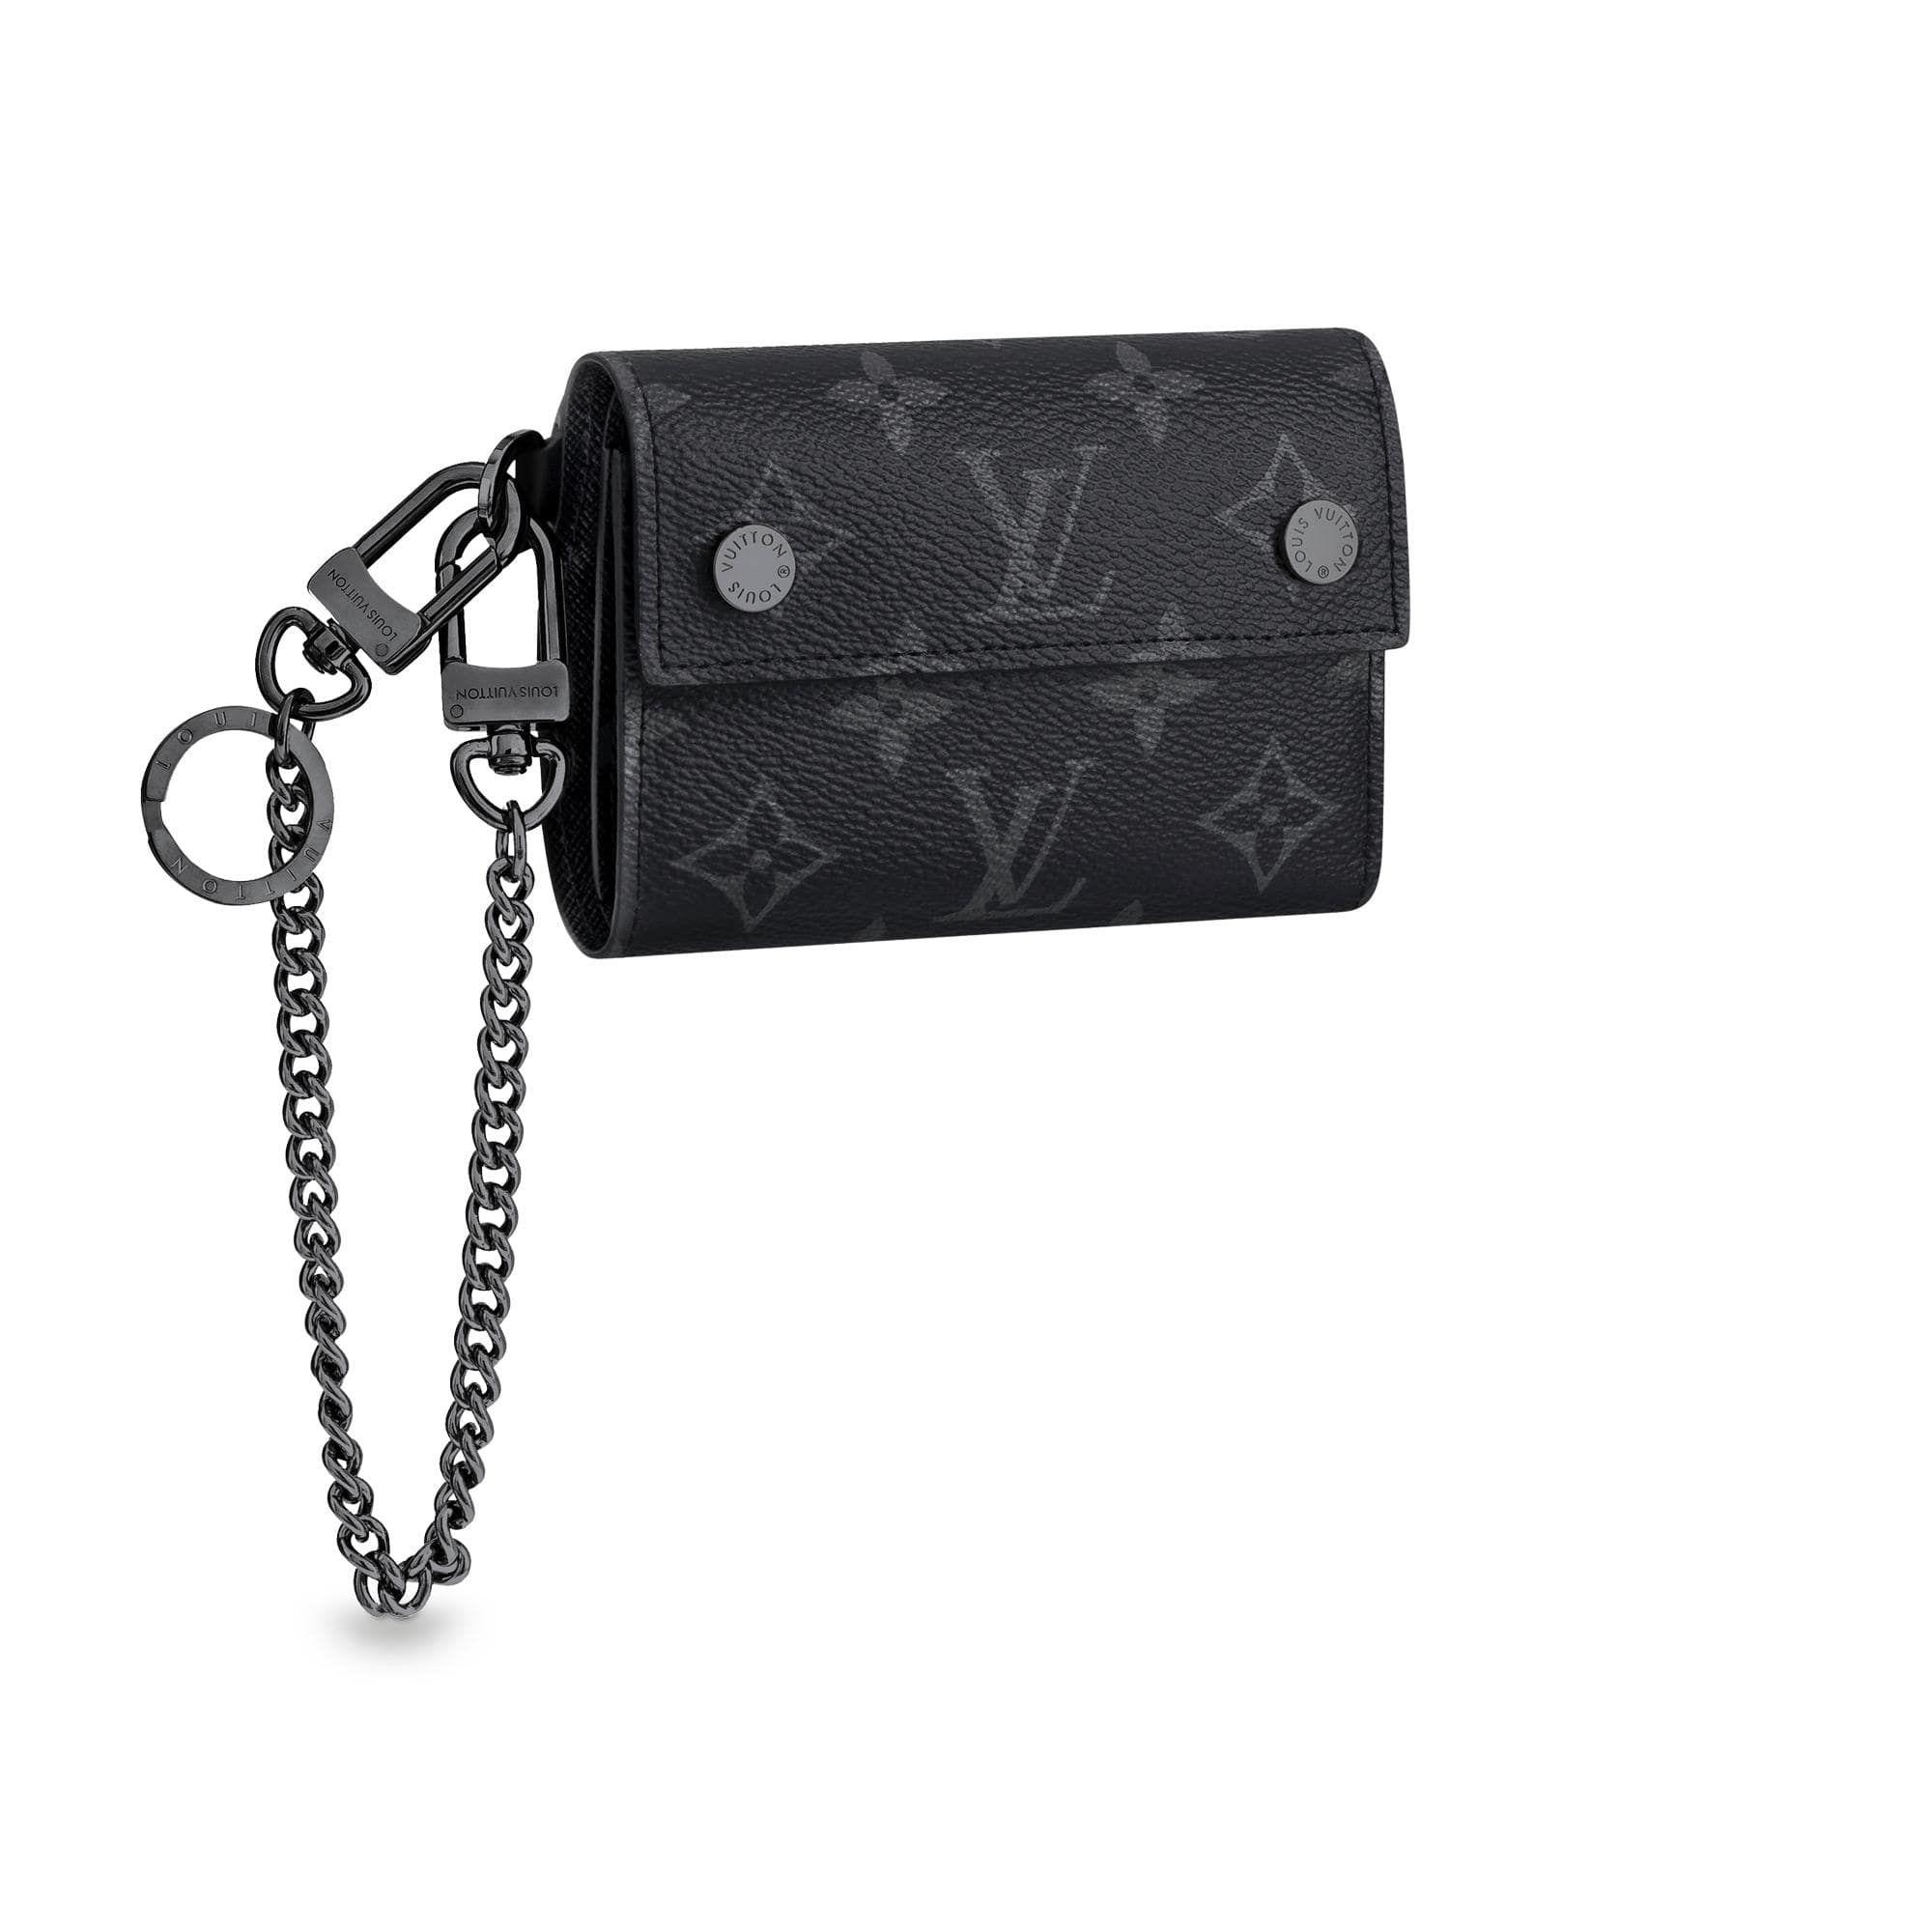 d6336b4e1e Rivets Chain Wallet via Louis Vuitton | Good Stuff | Wallet chain ...